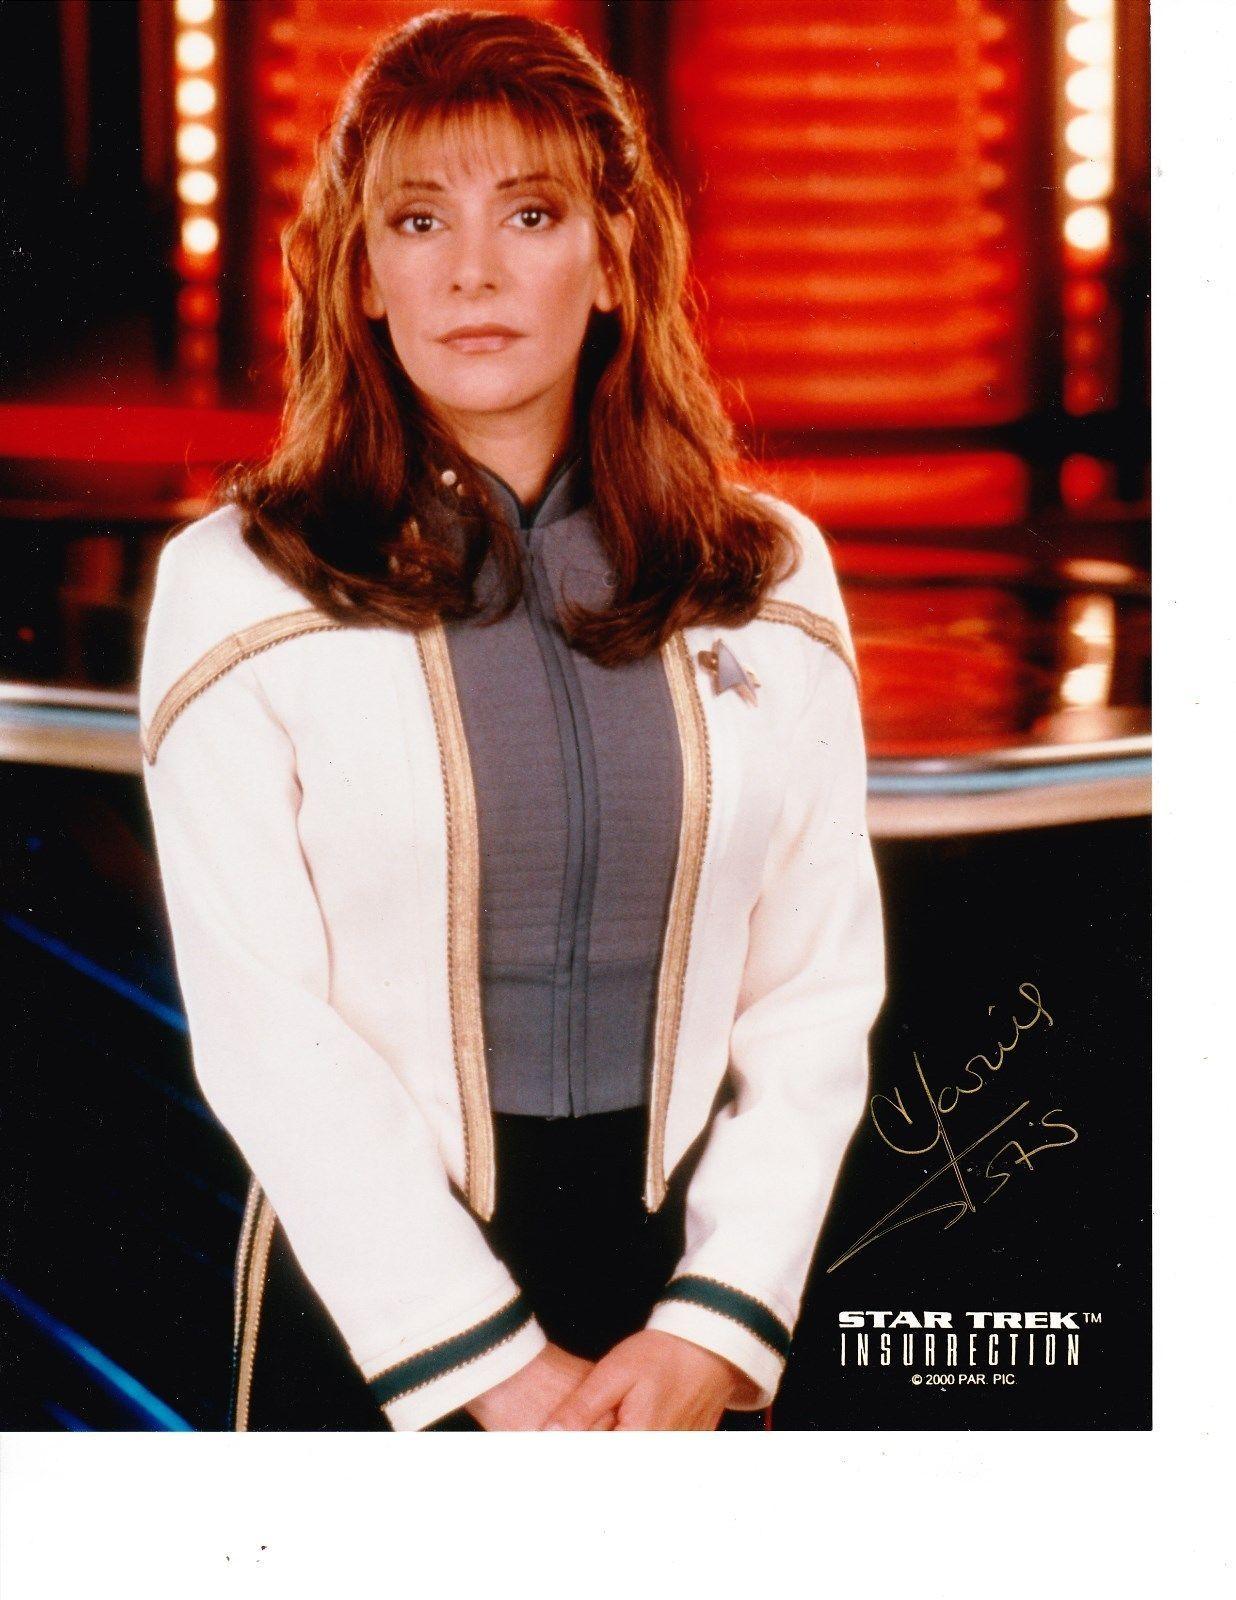 Marina Sirtis Star Trek Insurrection 8x10 Autographed